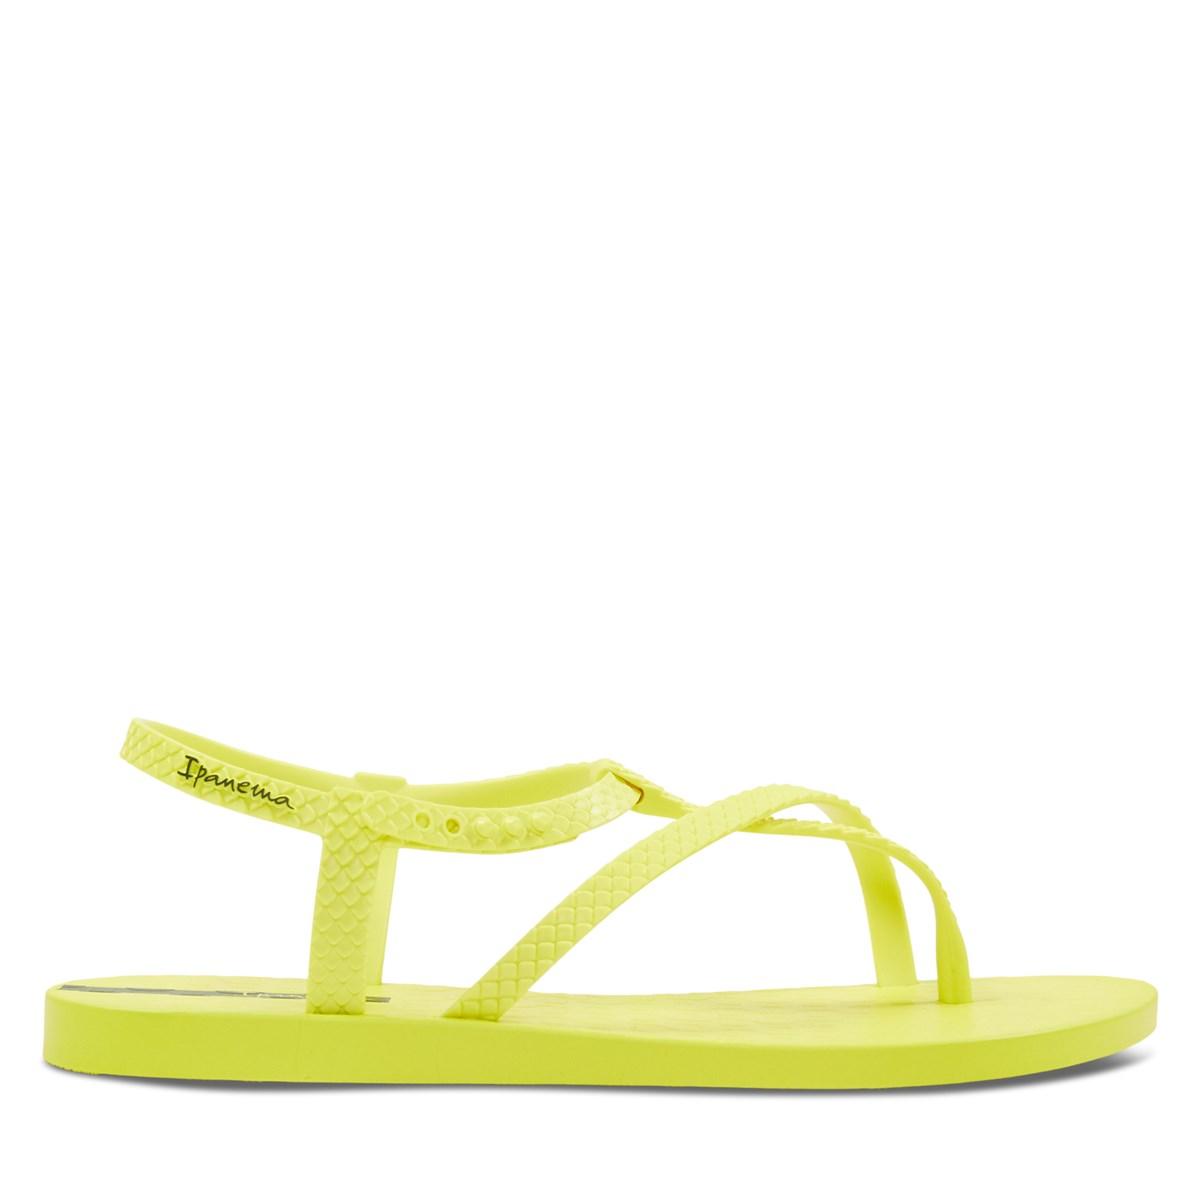 Women's Aphrodite Sandals in Yellow